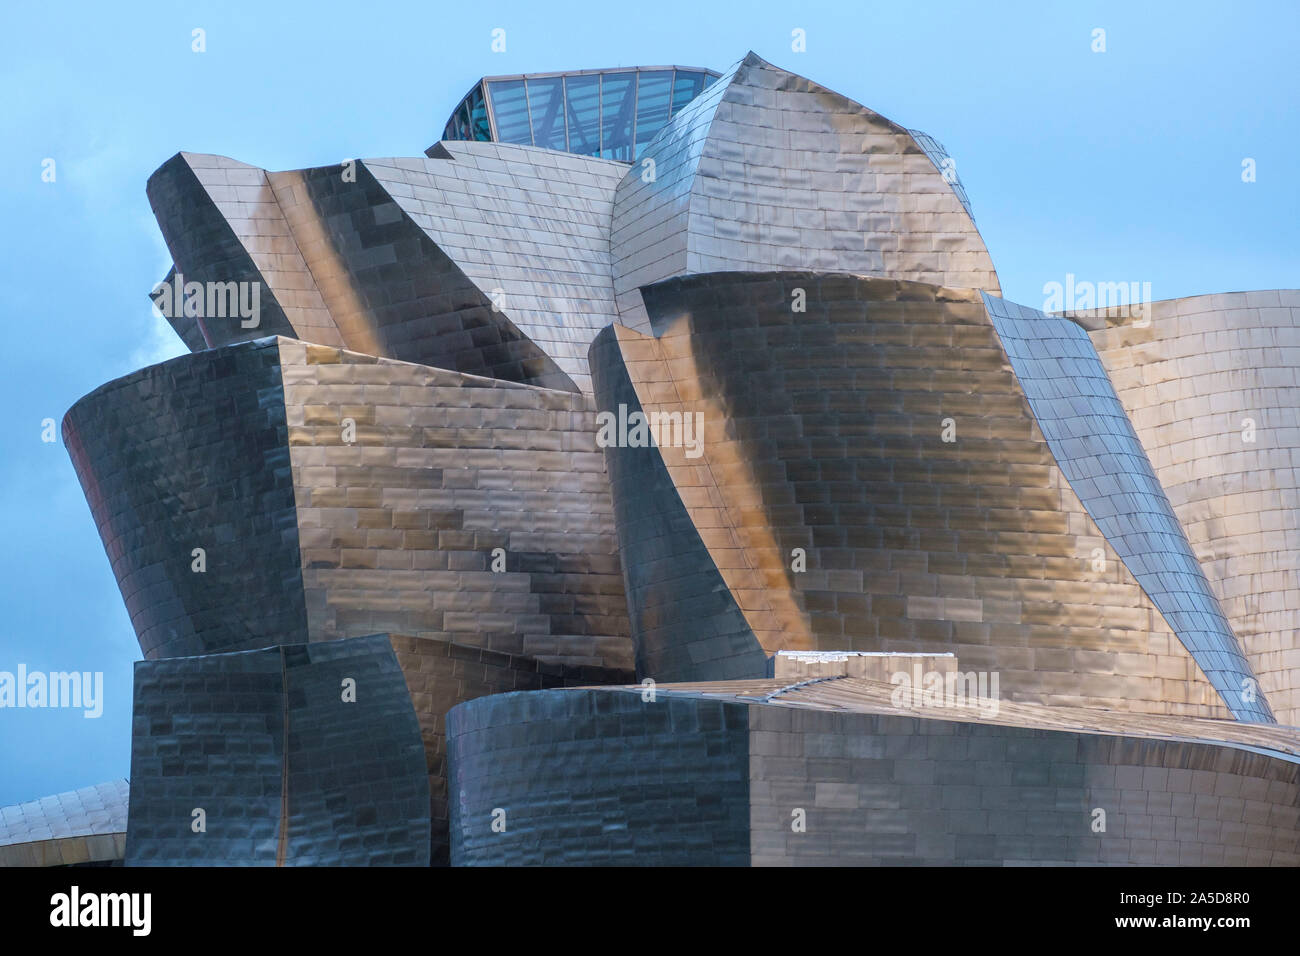 Musée Guggenheim de Bilbao, Espagne, Europe Banque D'Images